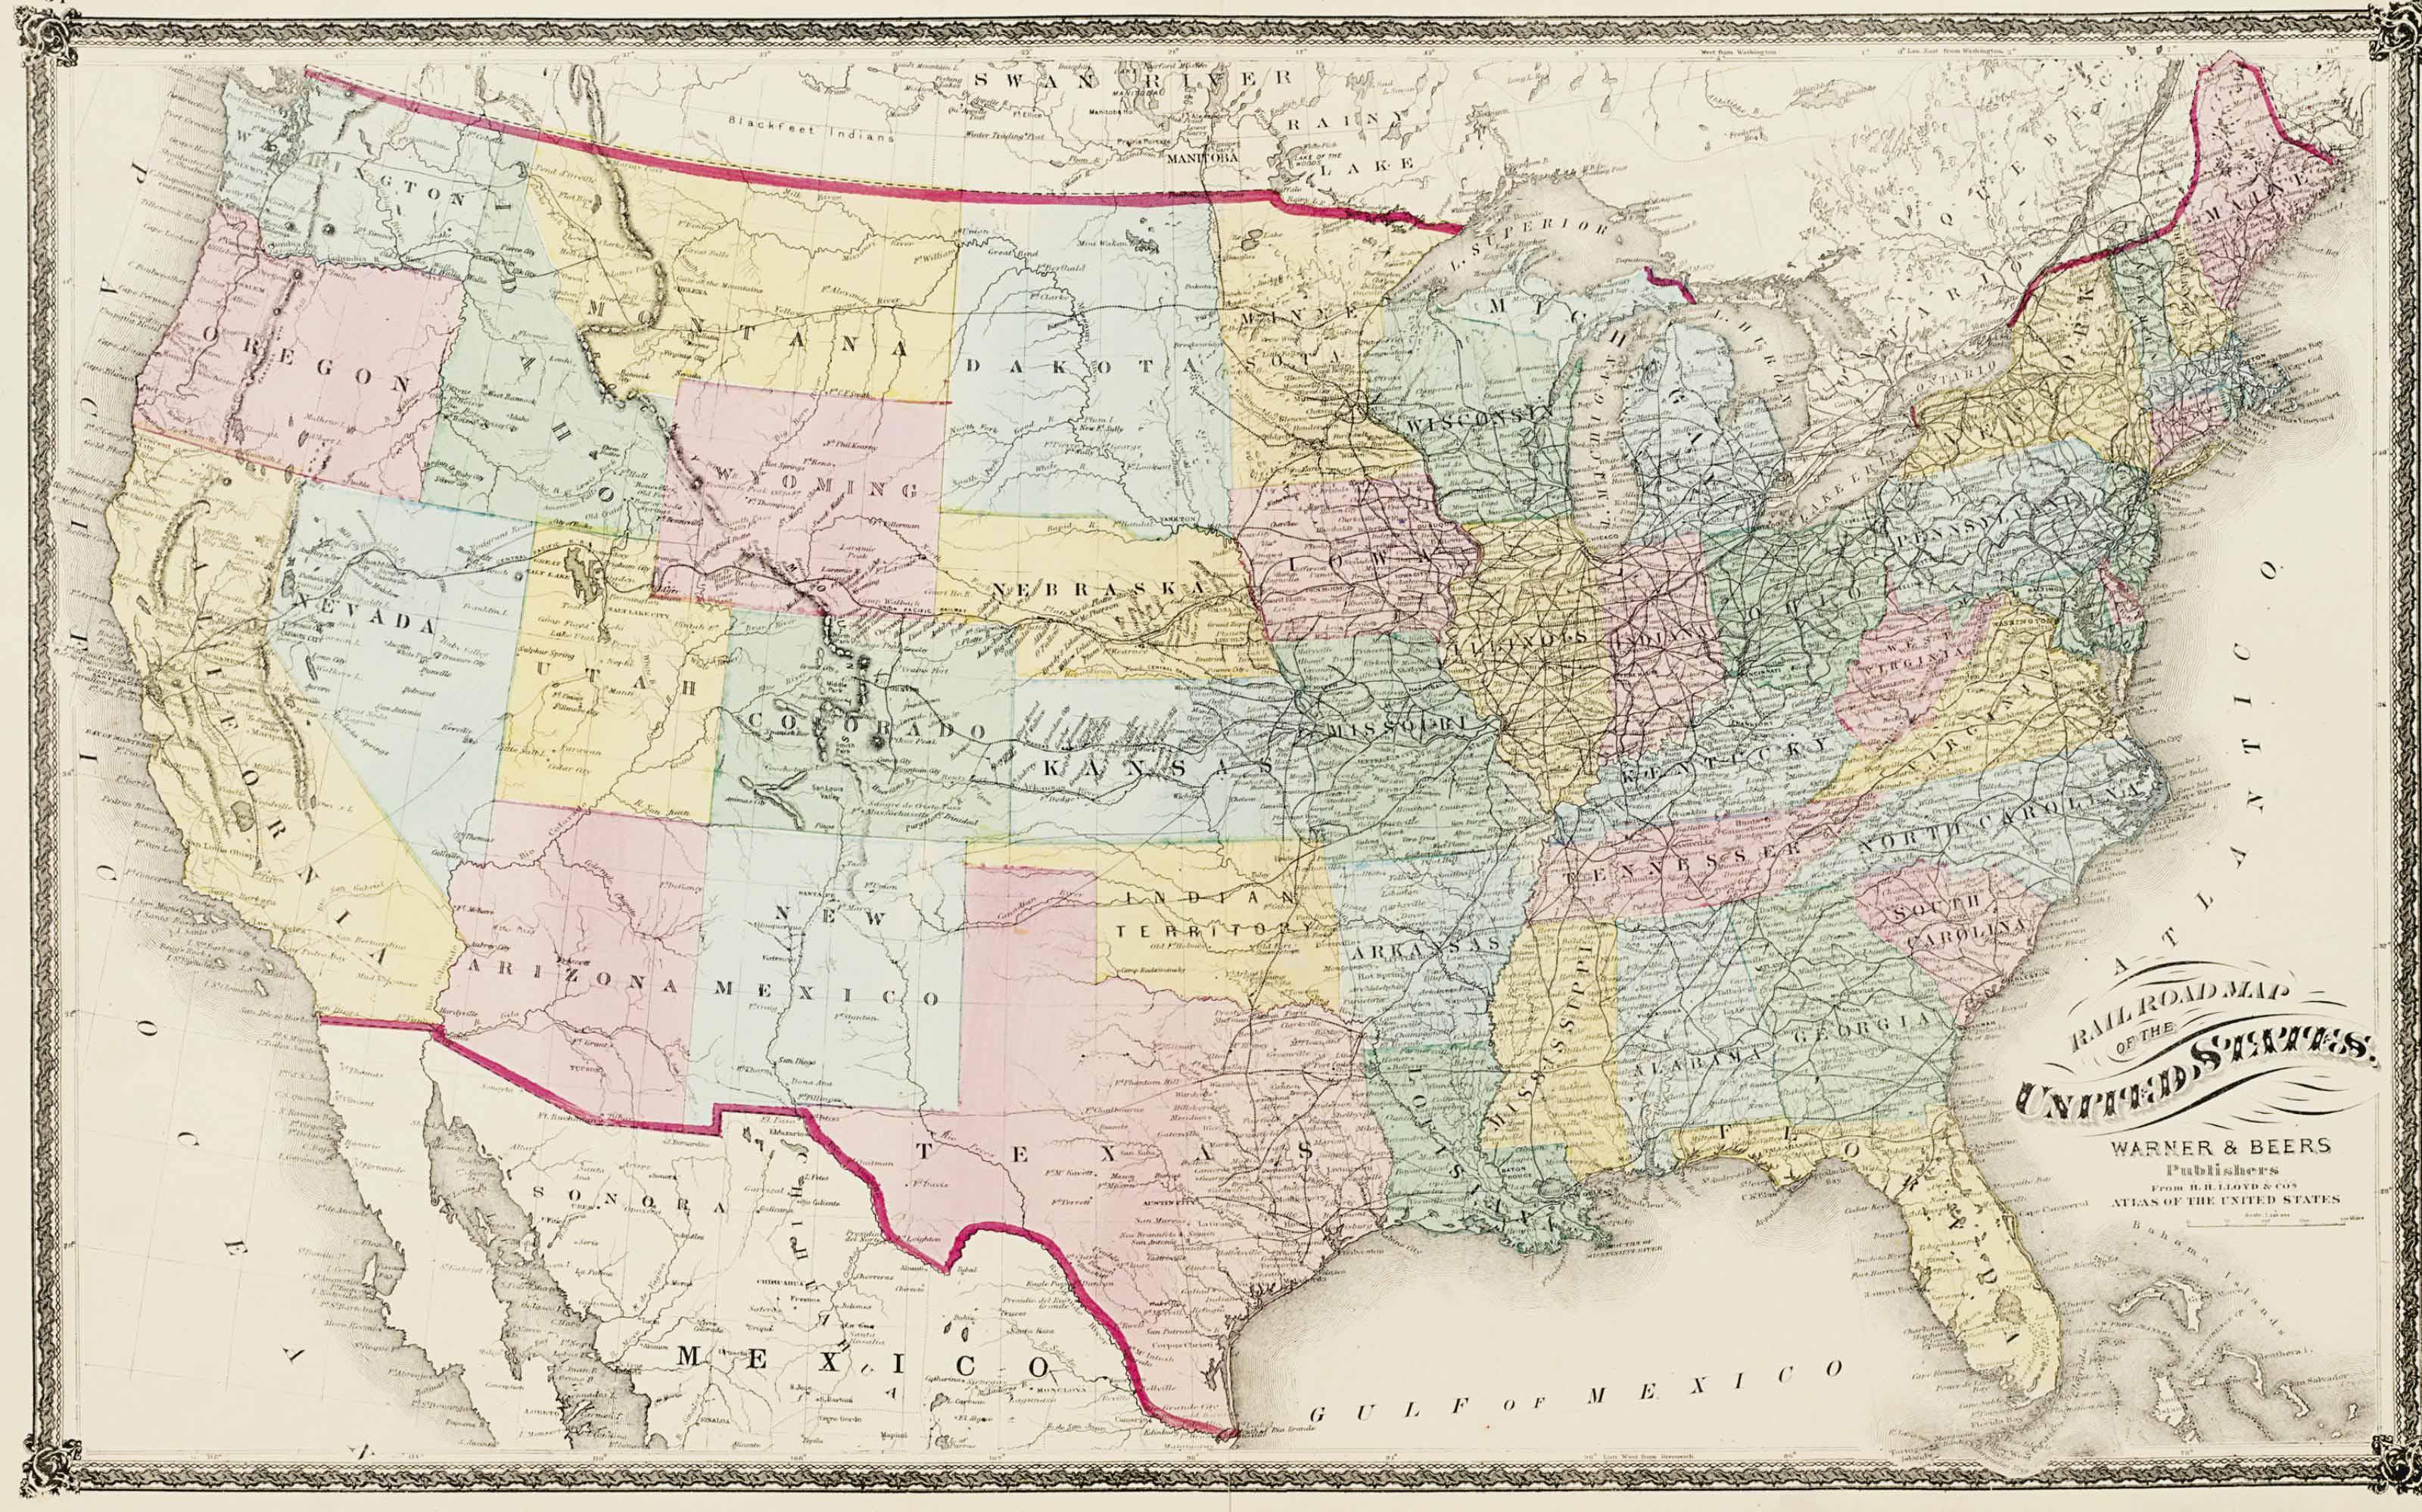 [19th CENTURY AMERICAS]. A gro